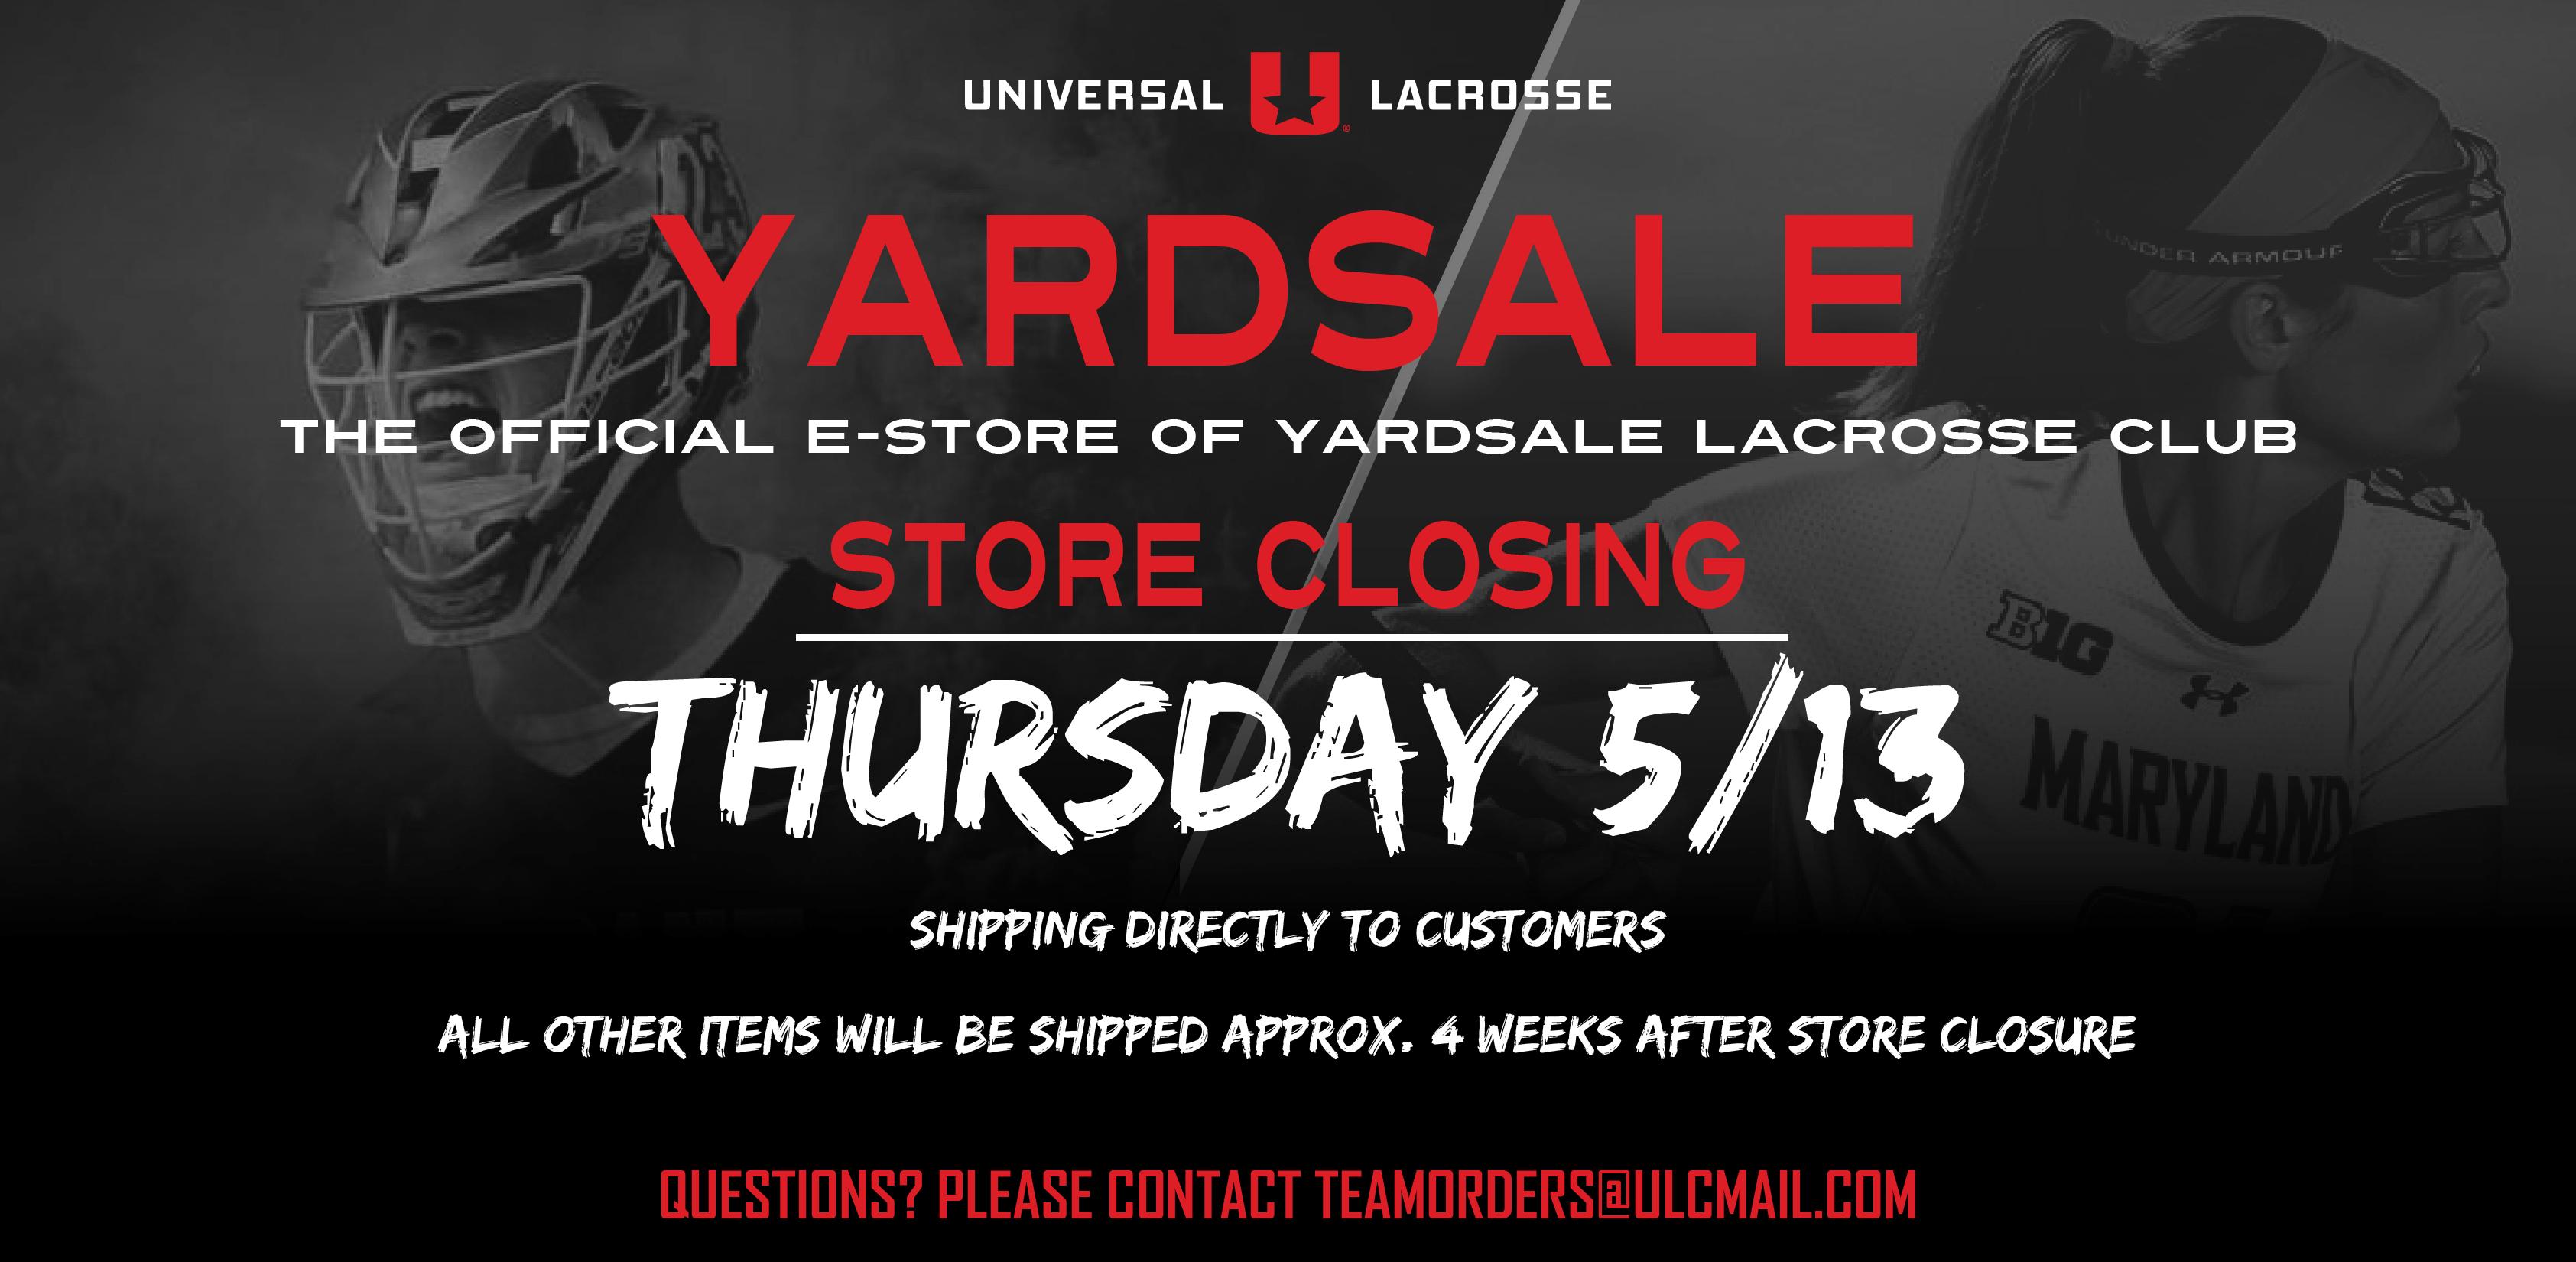 Yardsale Lacrosse Club